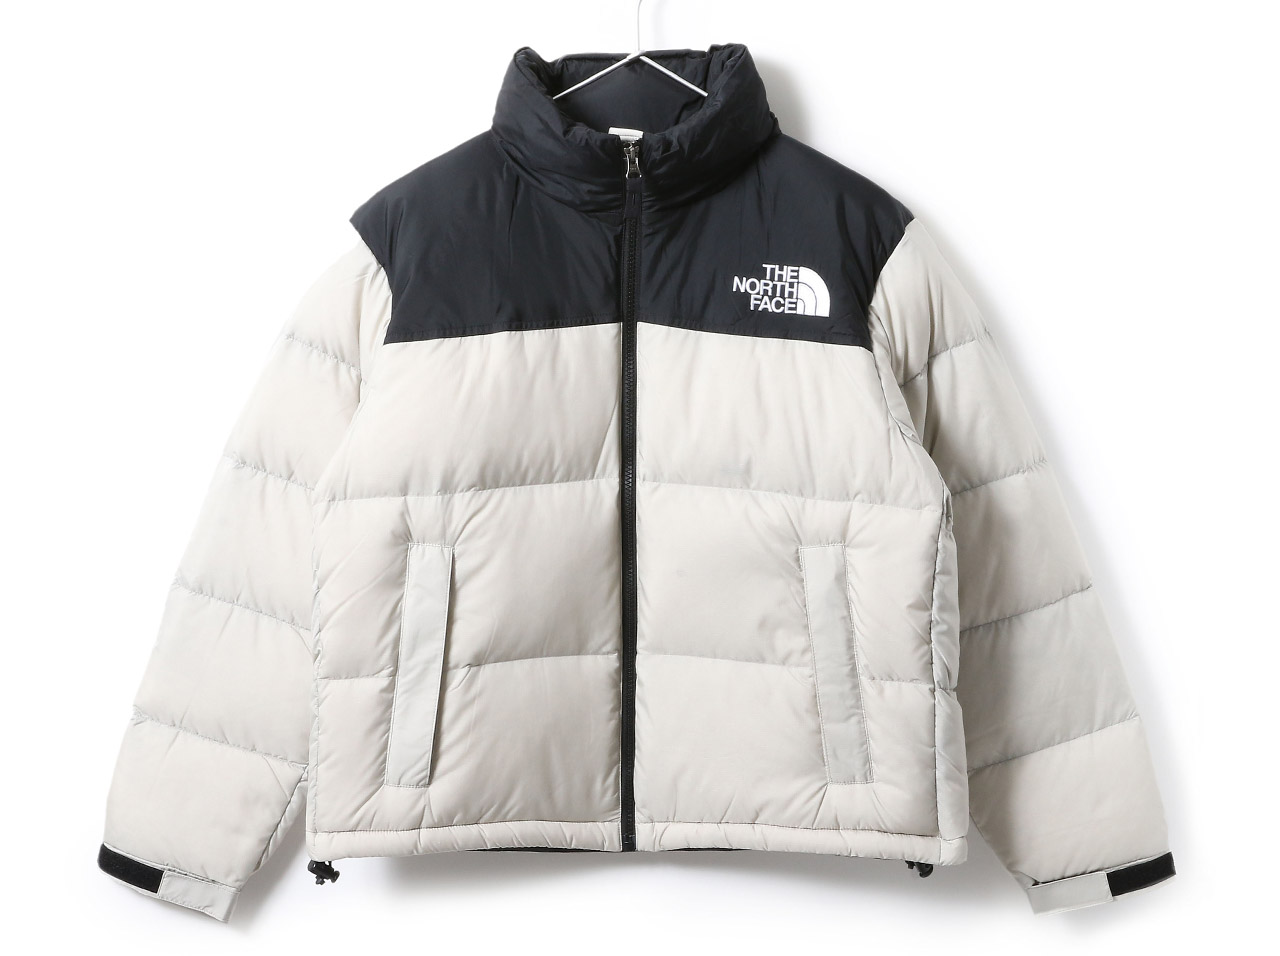 THE NORTH FACE Short Nuptse Jacket(NDW91952)【ザ ノースフェース ショートヌプシジャケット】【レディースファッション】【アウター】【ジャケット】【ストリート】